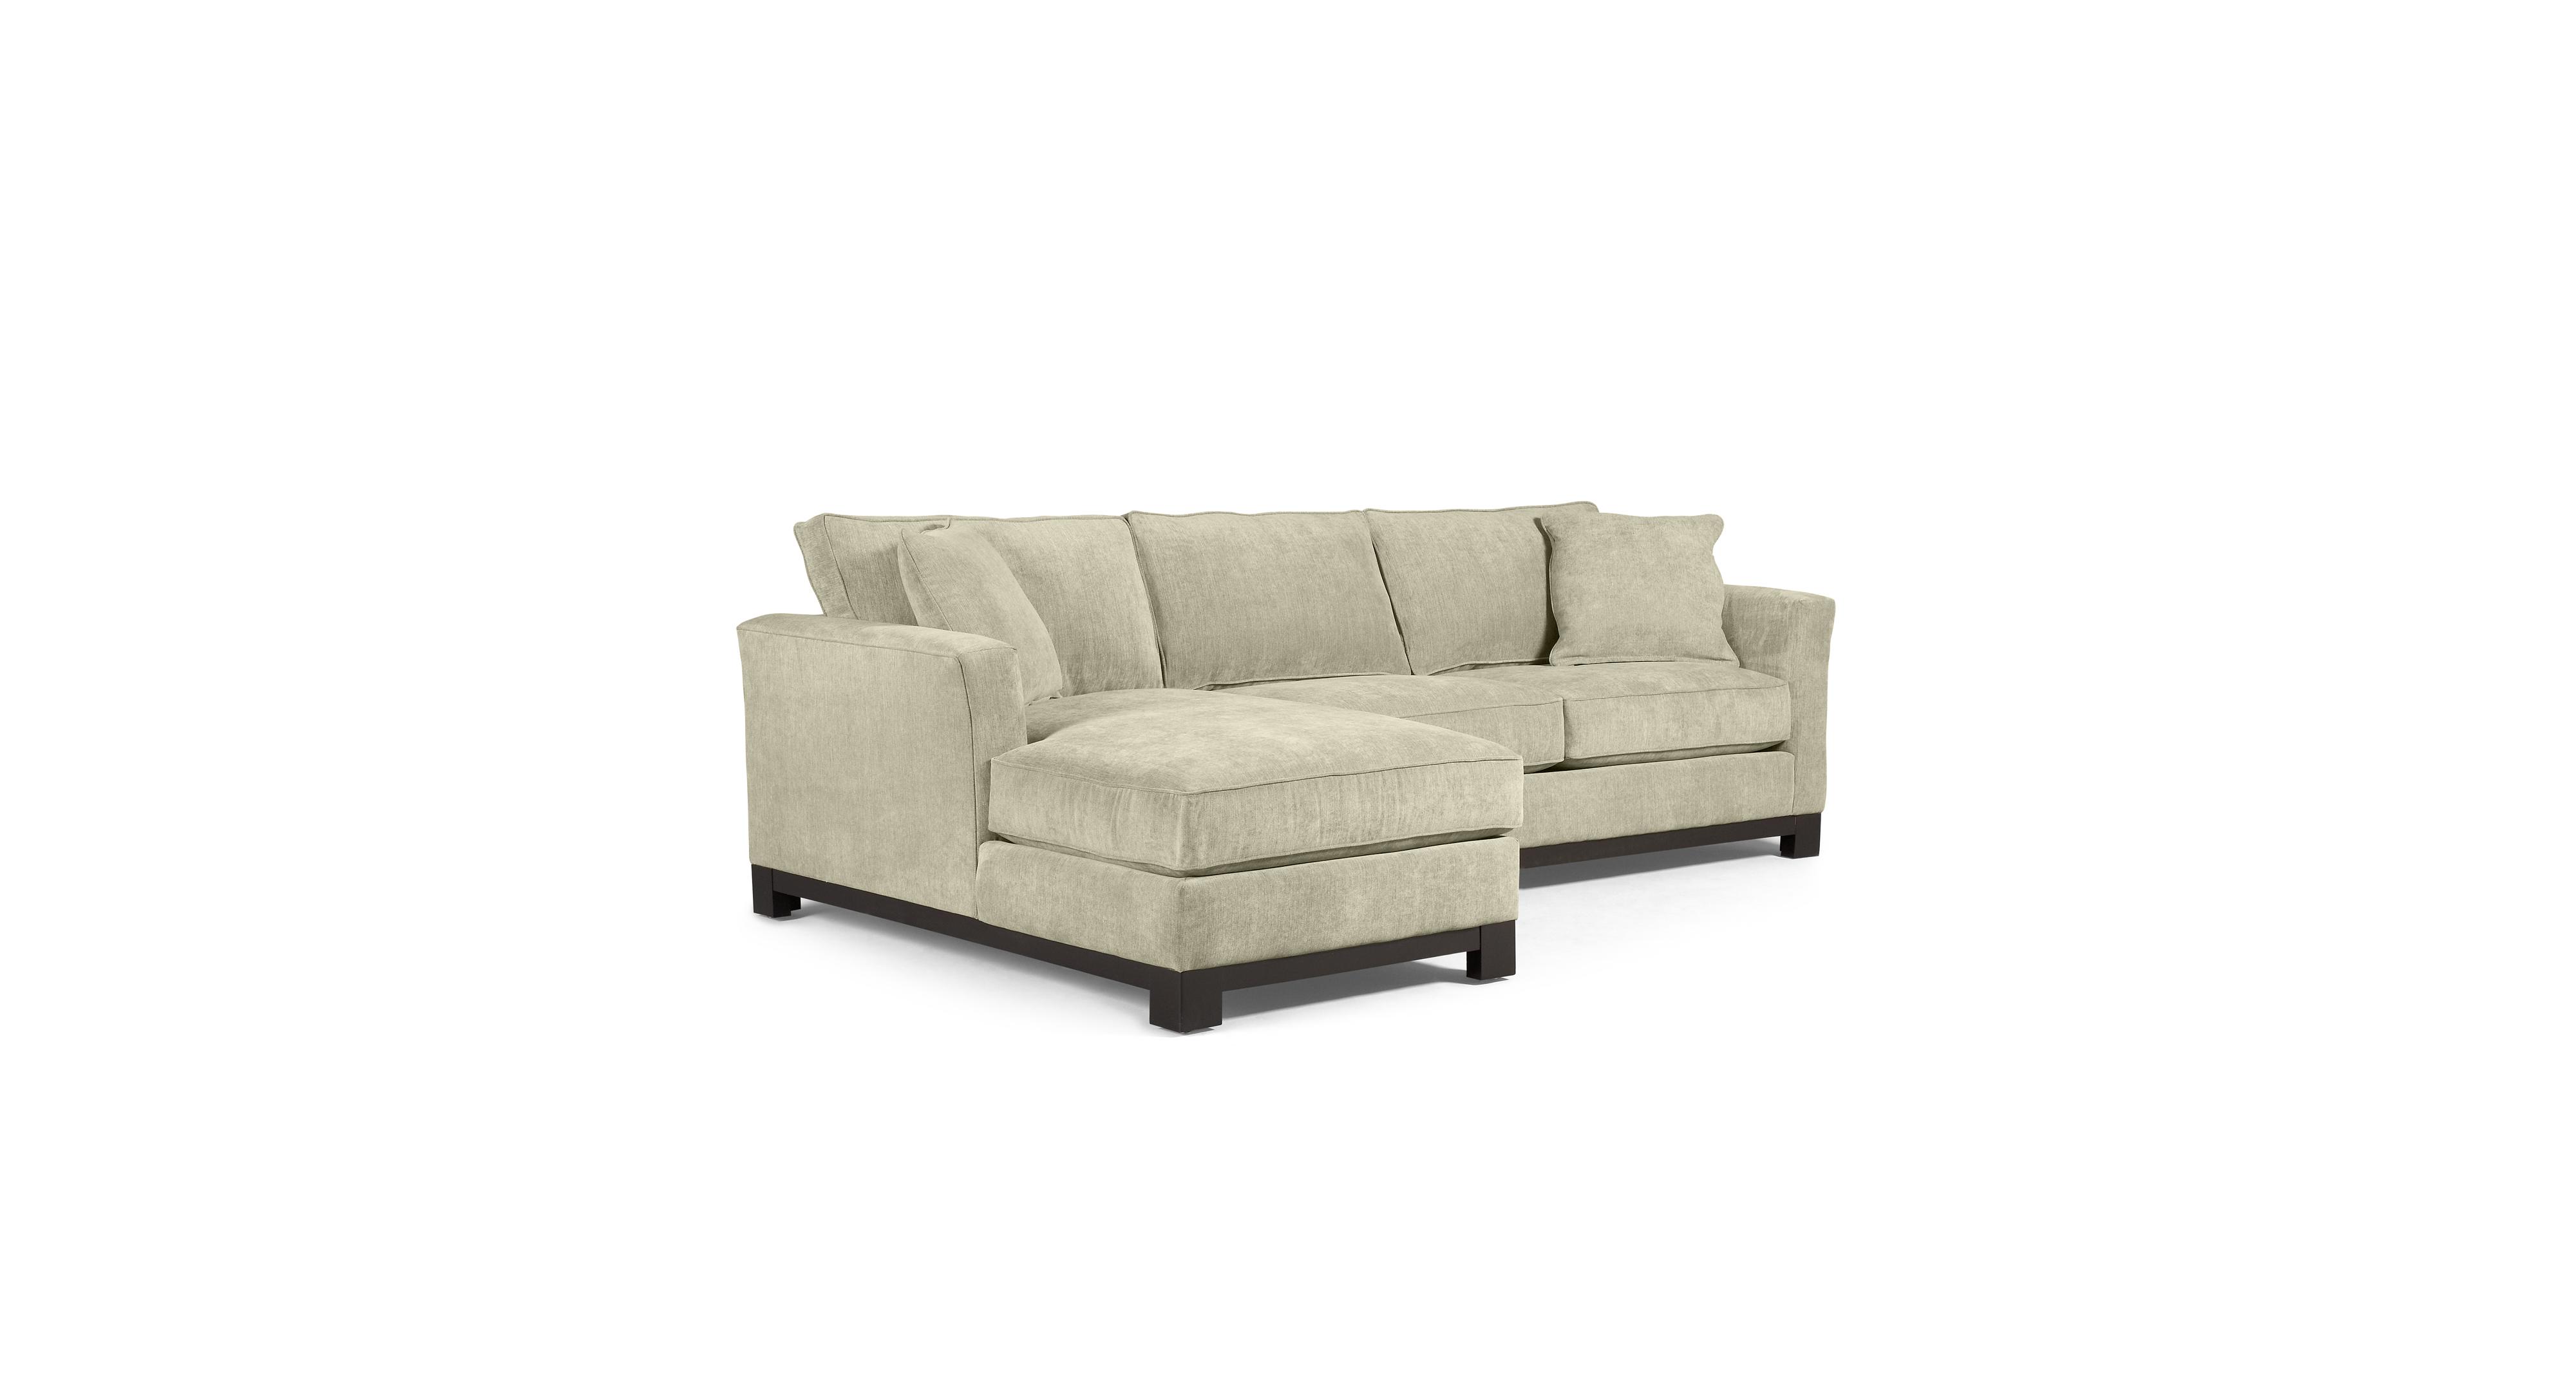 Kenton Fabric 2 Piece Chaise Sectional Apartment Sofa Custom